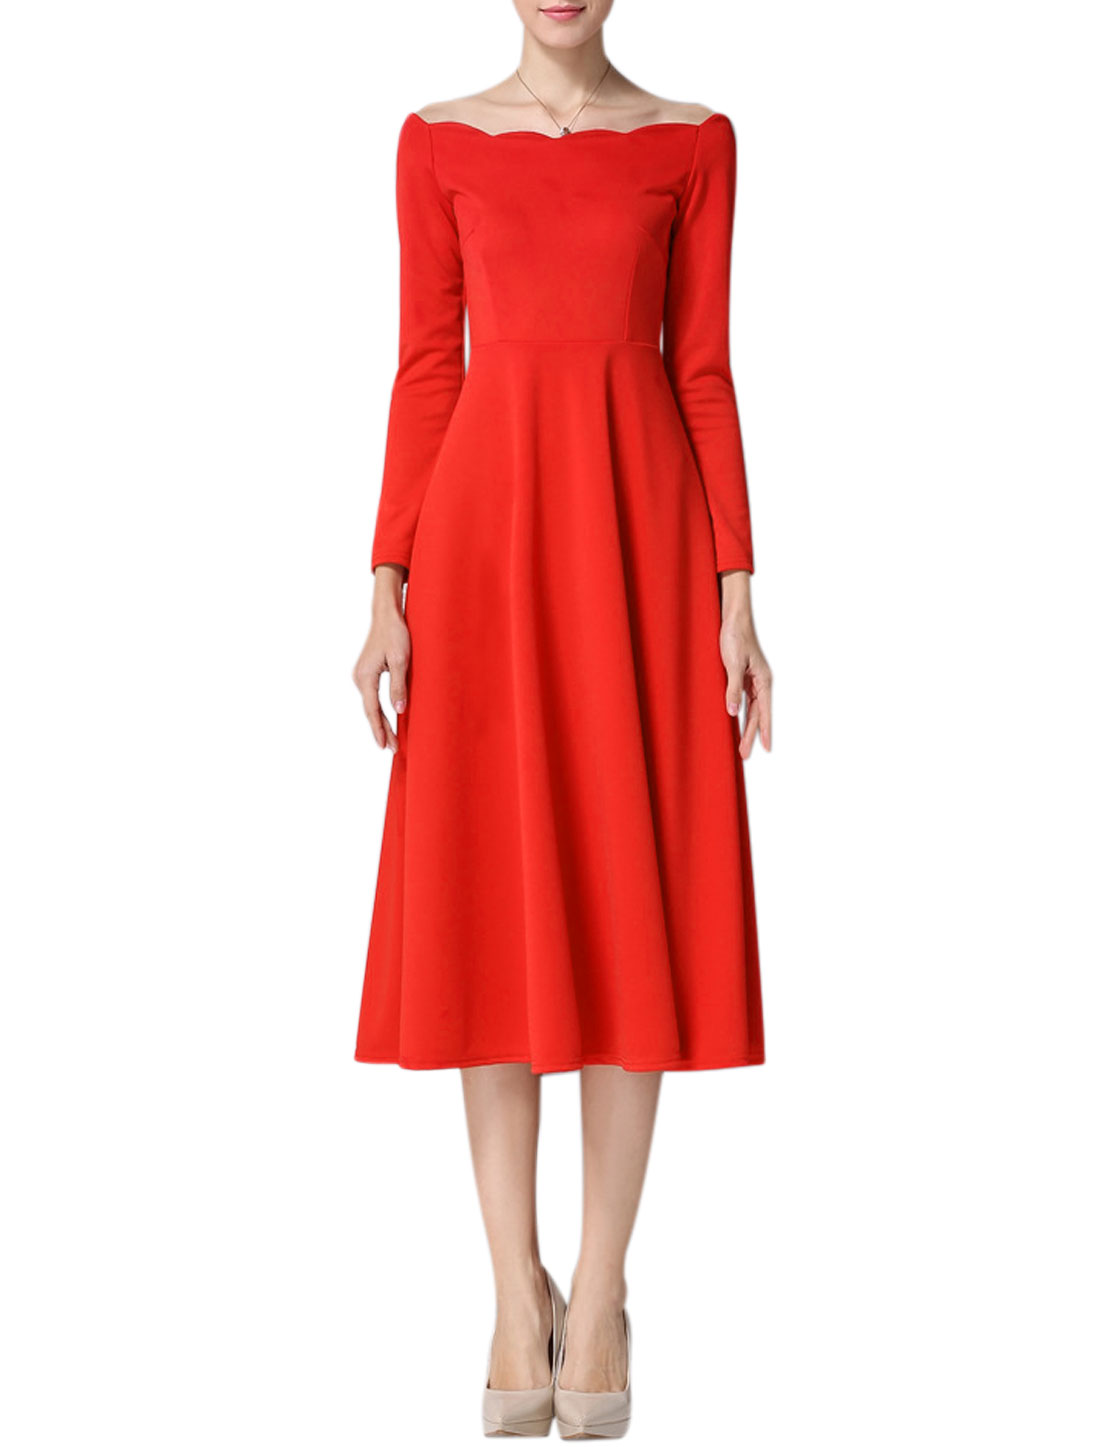 Woman Scalloped Boat Neck Bracelet Sleeves Midi Dress Red M